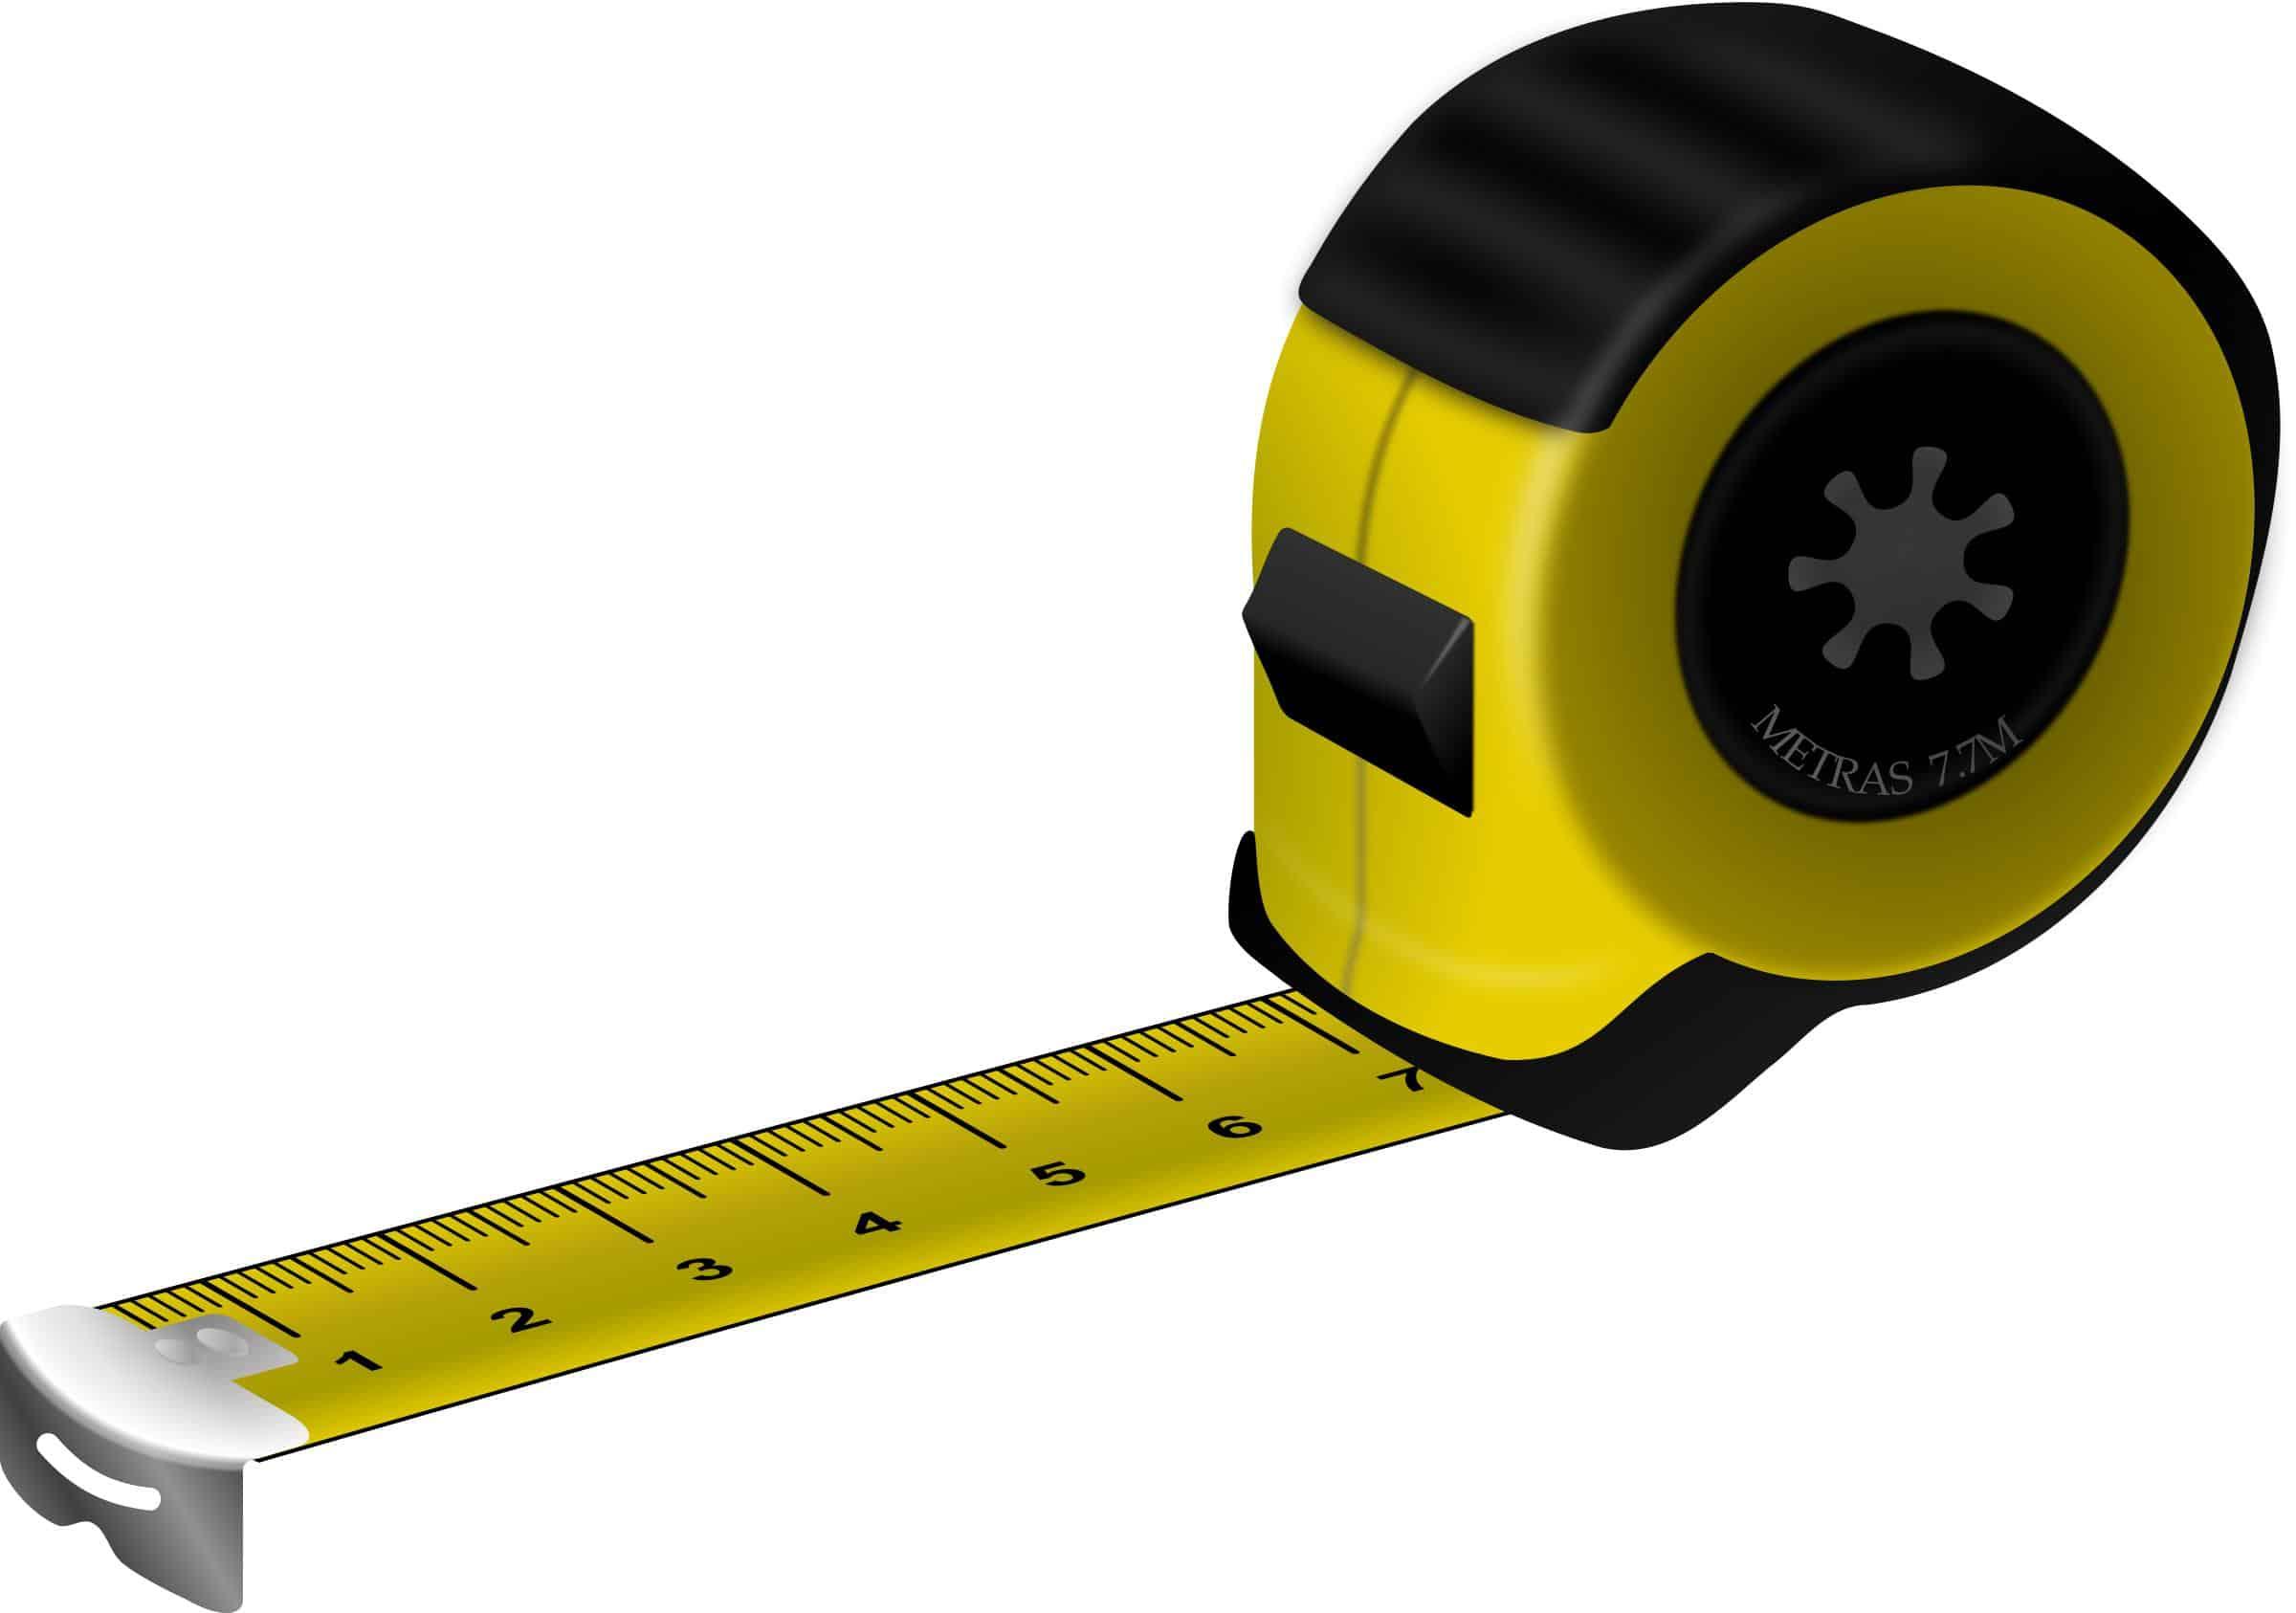 meter for measuring, Metras Icons PNG